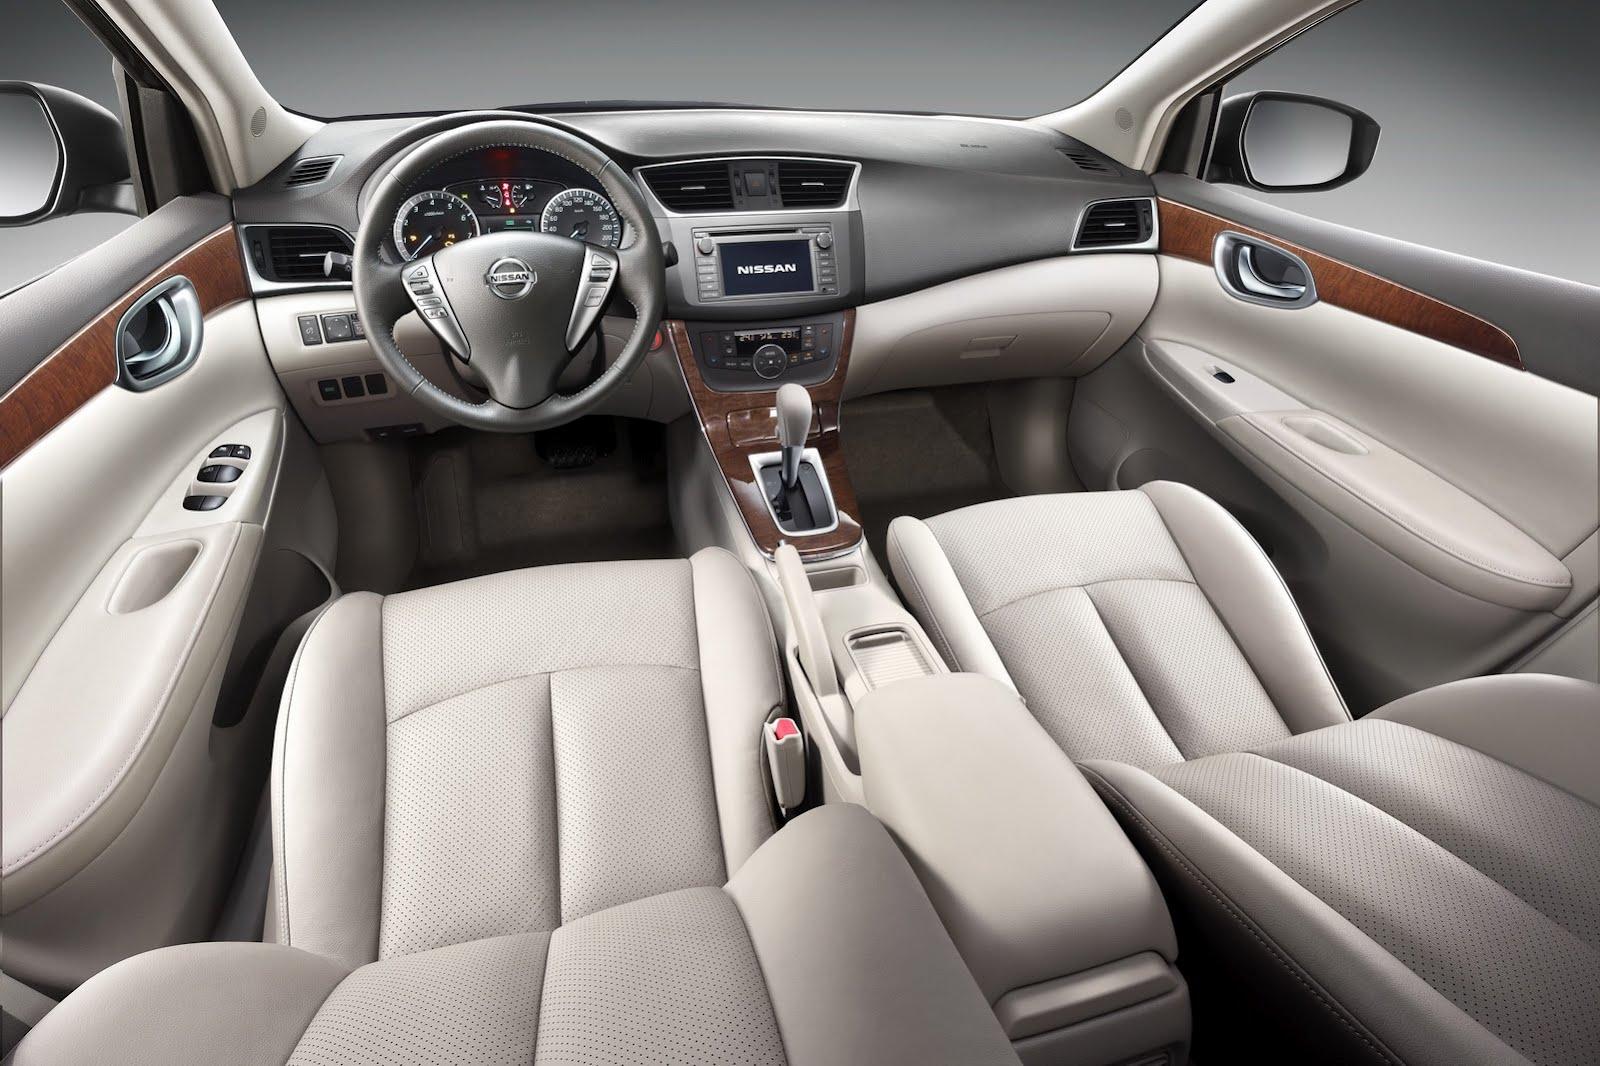 370Z Nismo 0 60 >> 2013 Nissan Sentra SE-R Nismo   TechnoLOGY